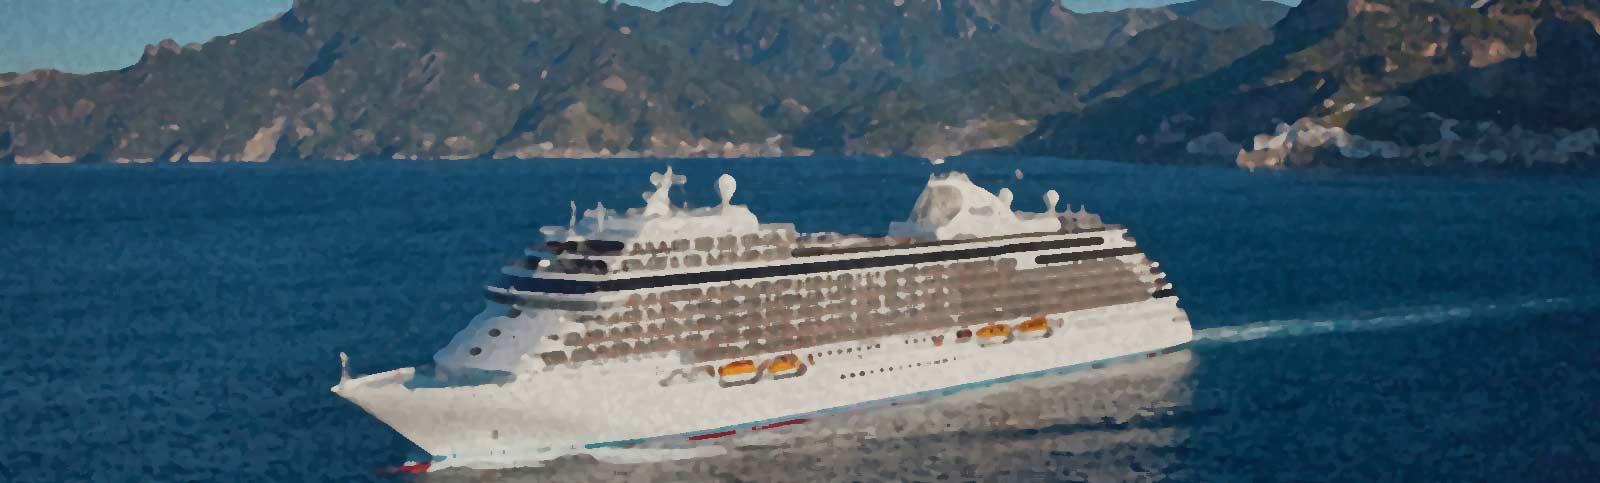 Top 6 Mediterranean Cruise Locations